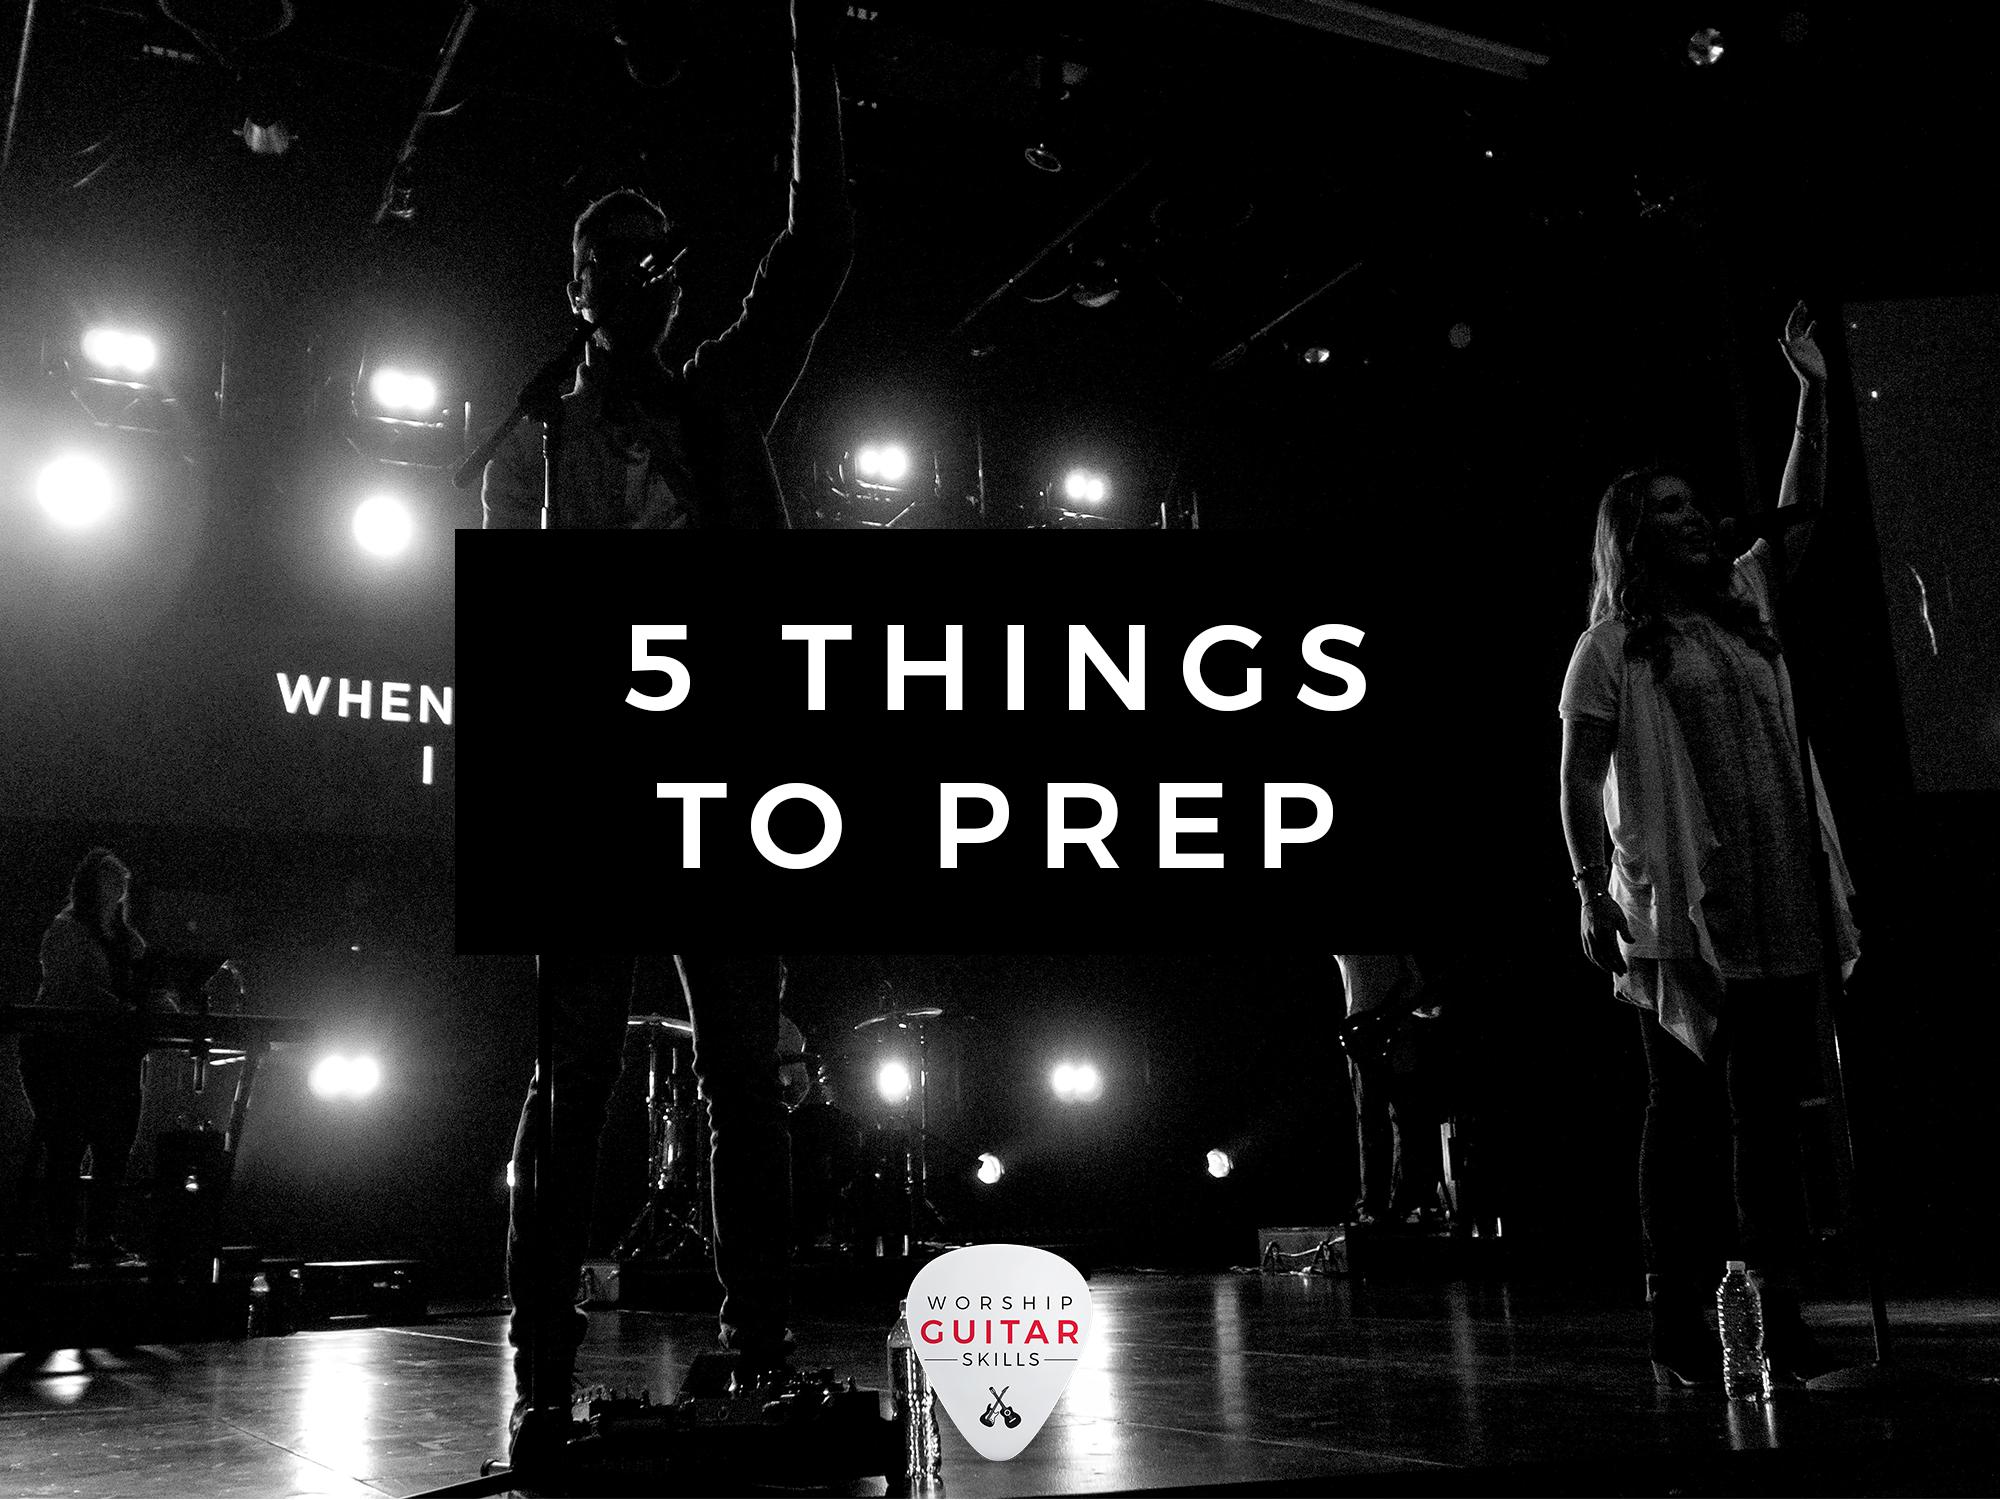 5 Things Every Worship Guitarist Needs To Prepare